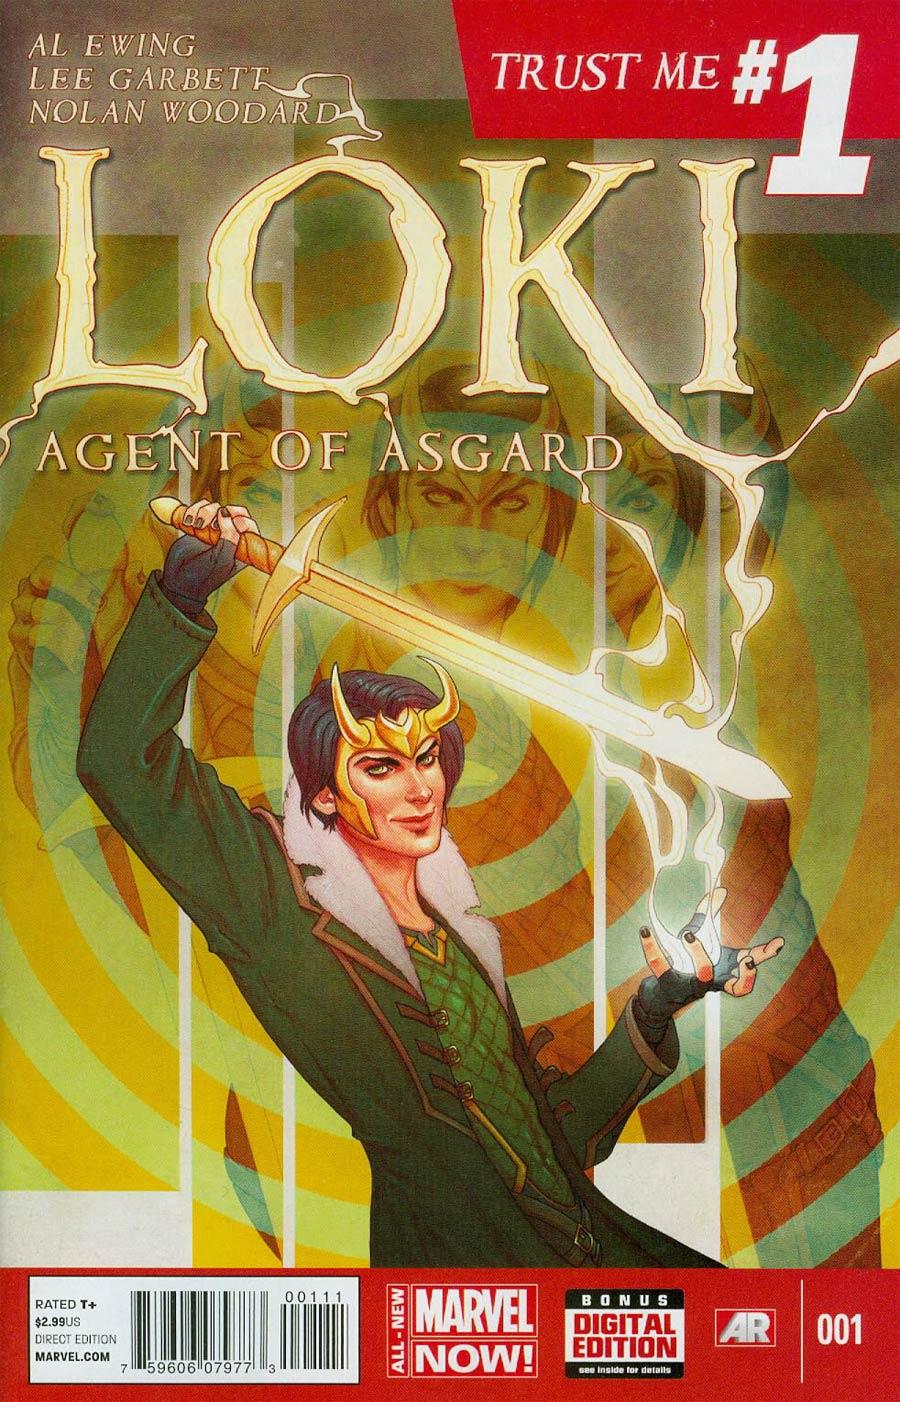 Loki Agent Of Asgard #1 Cover A 1st Ptg Regular Jenny Frison Cover